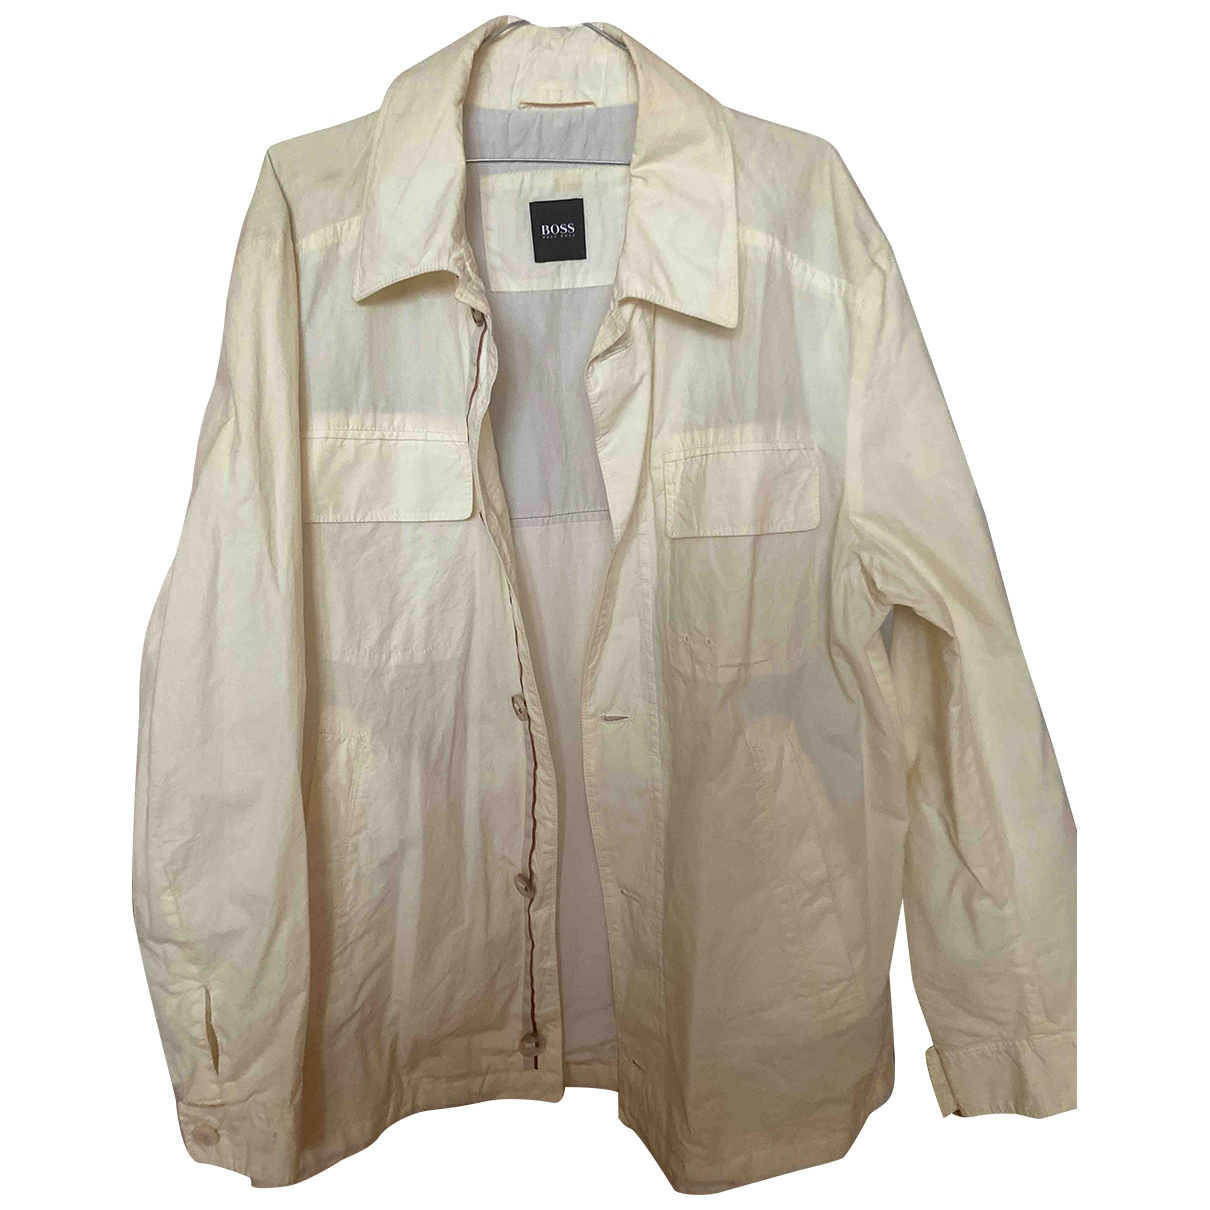 Boss \N Ecru Cotton jacket  for Men L International